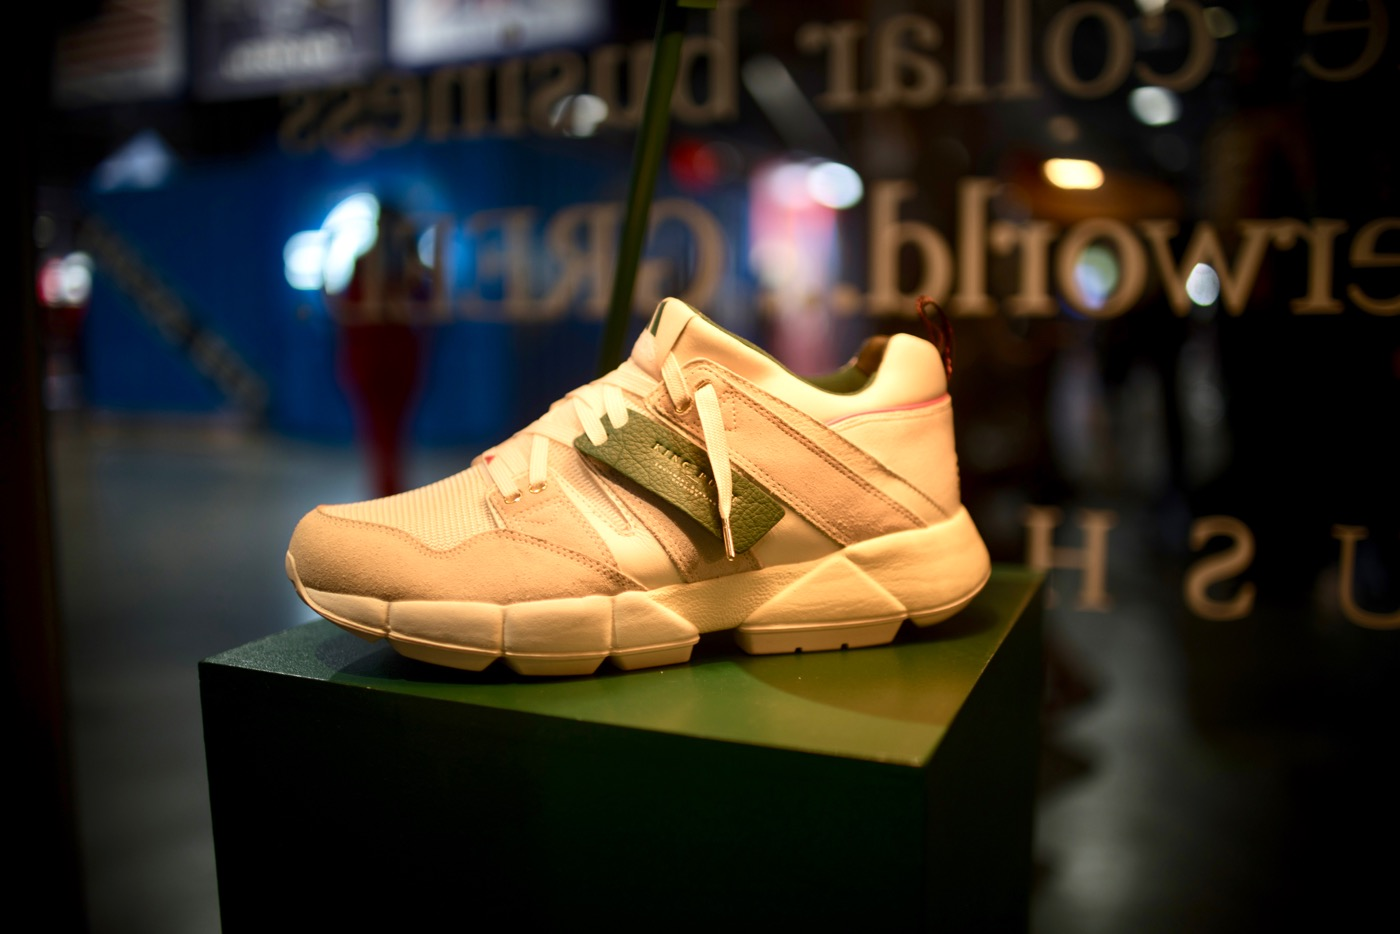 sale retailer 49e92 17e87 King Push Exclusive Adidas   ComplexCon 2018. Photo by Markie Escalante  ( Markie818) for www.BlurredCulture.com.